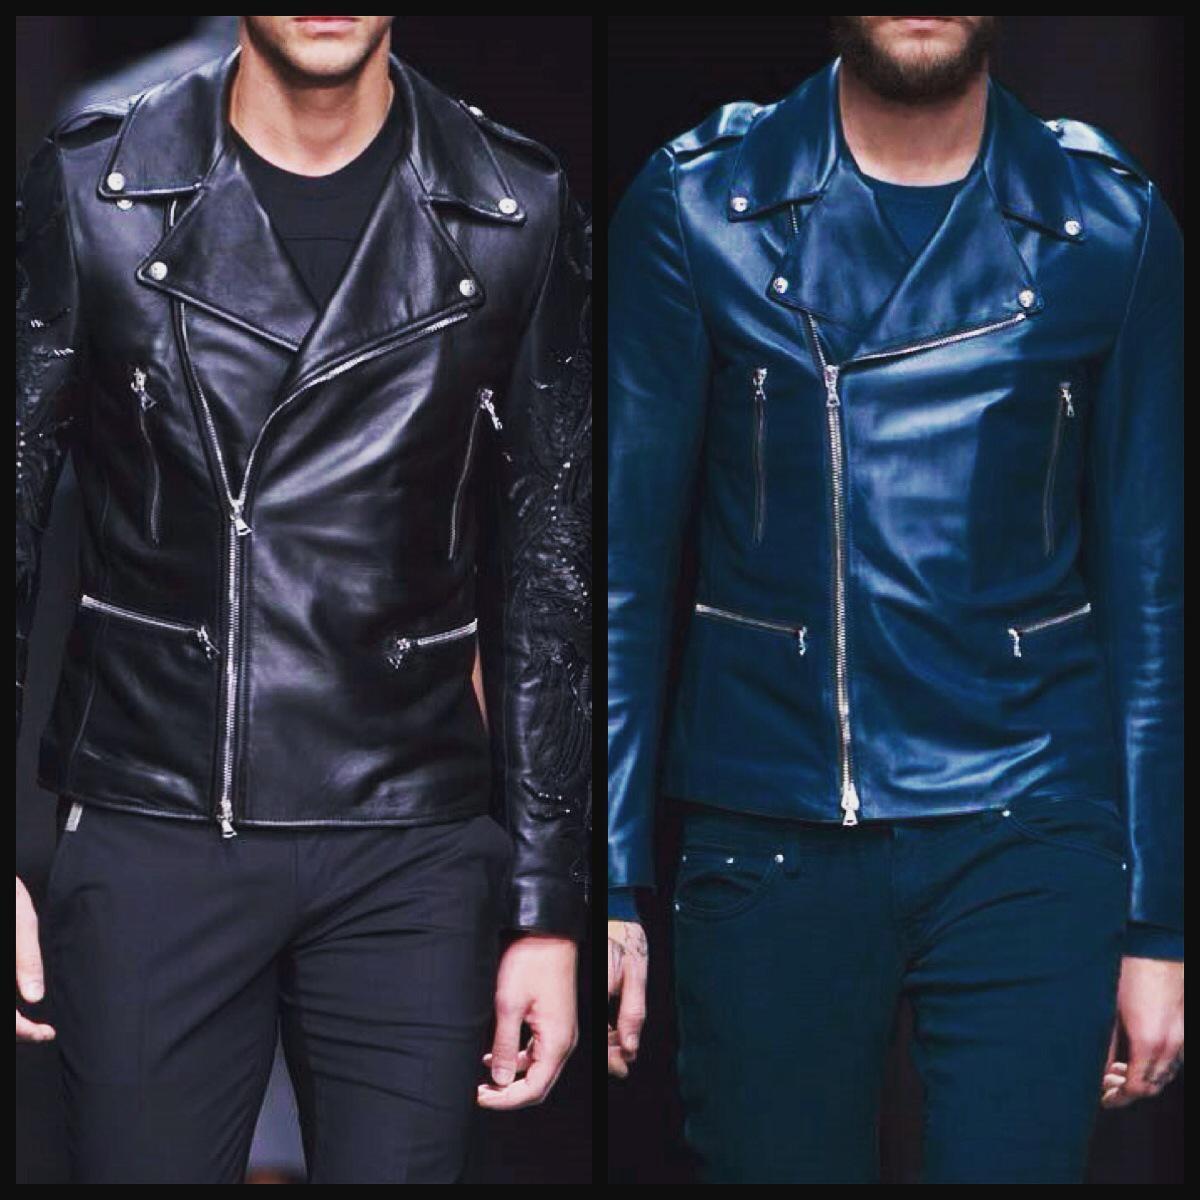 #johnrichmondofficial #johnrichmond #menswear #fw1516 #leatherjacket #leather http://t.co/UnaWkM410q